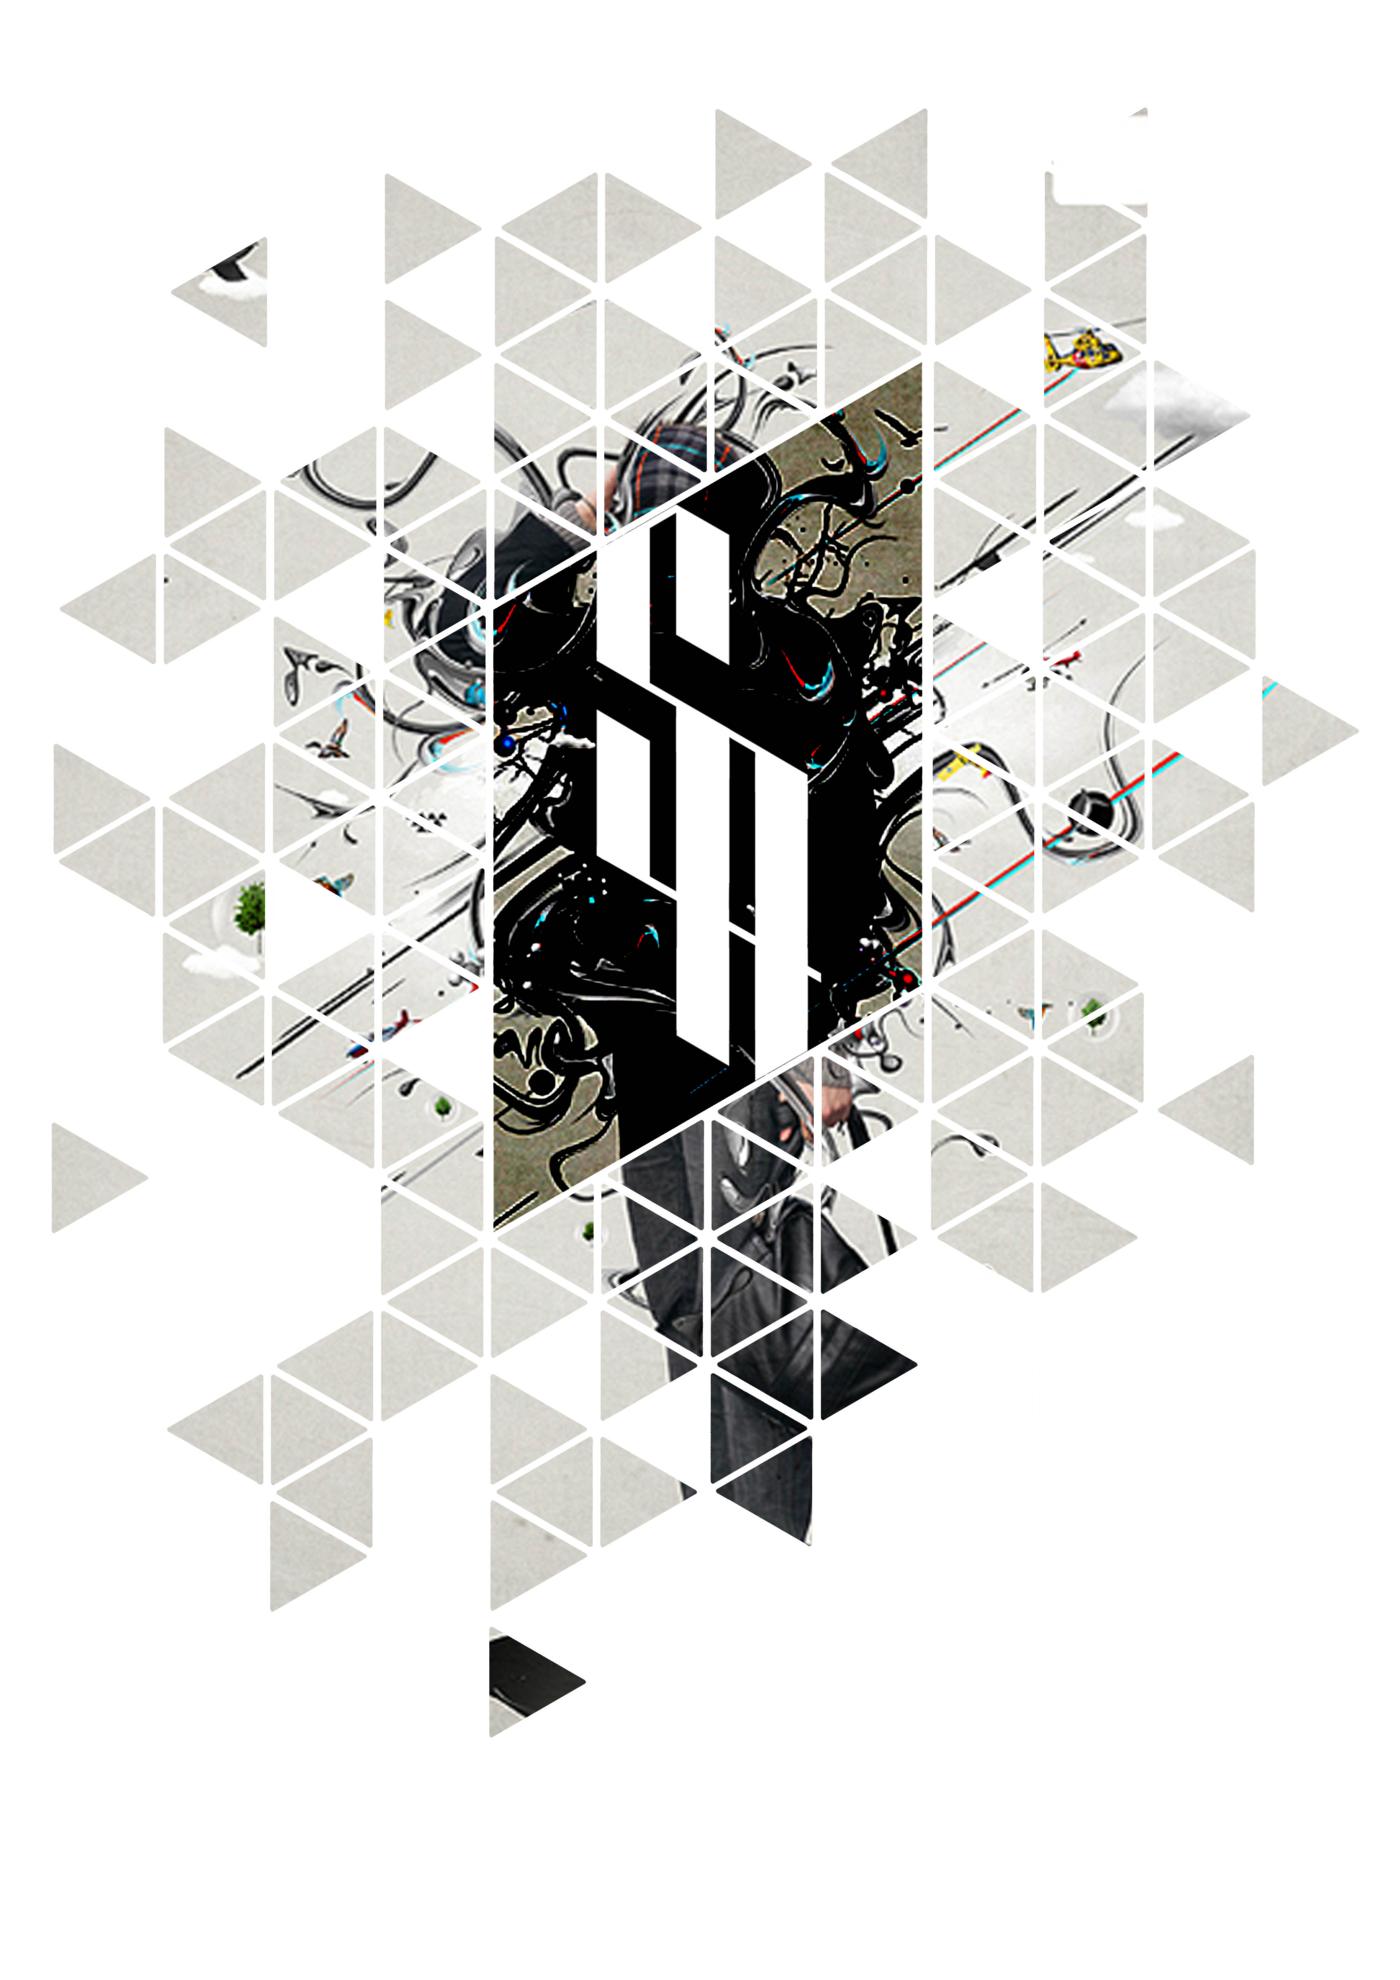 K M Designs sa logo designed by km designs by shahzad ali at coroflot com